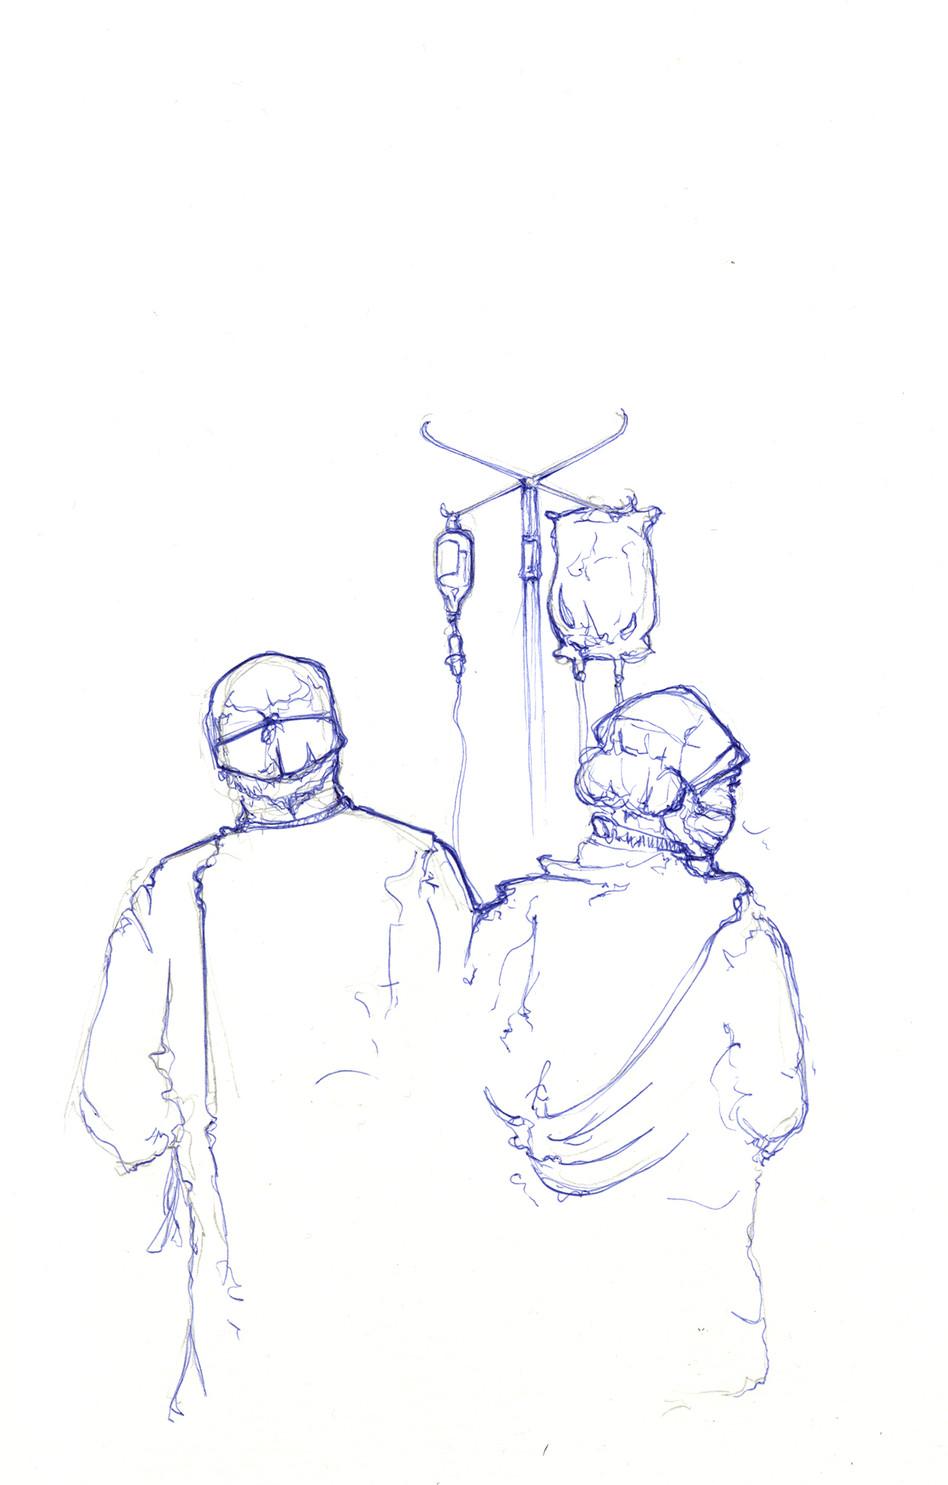 Sketch IV